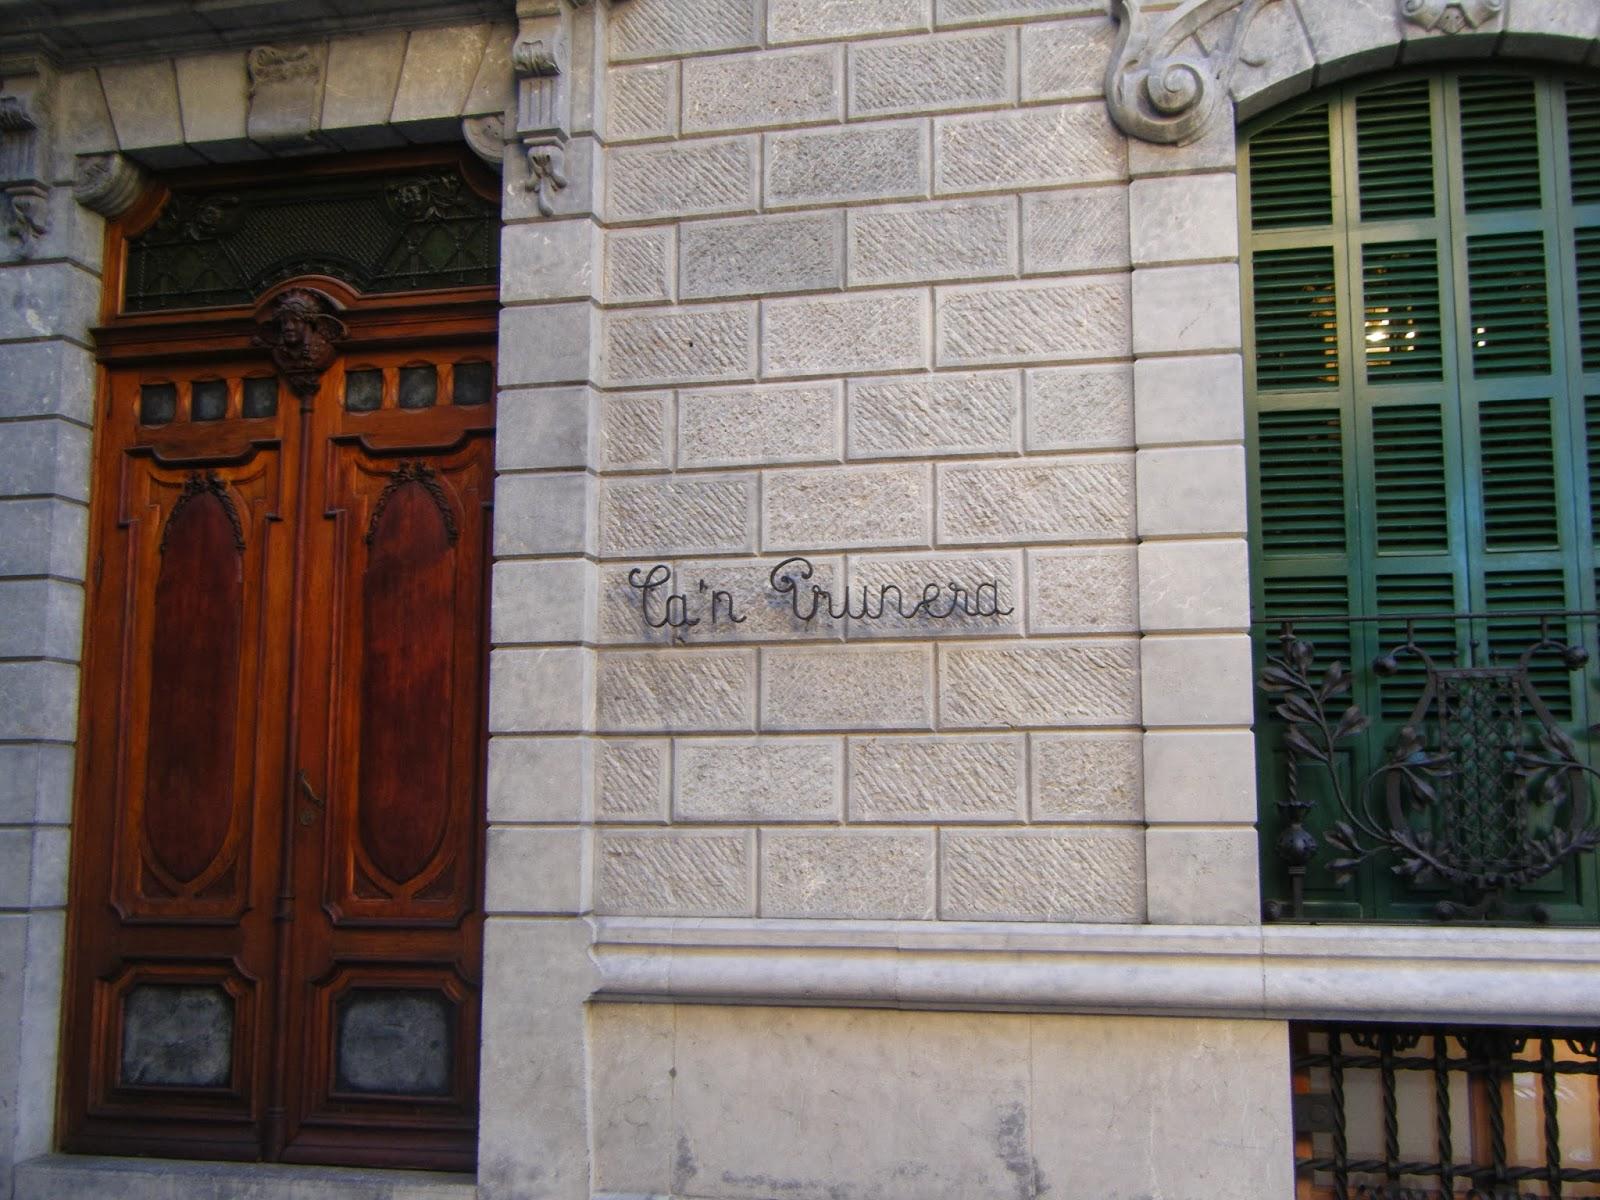 Mallorca testim!: Can Prunera Museu Modernista